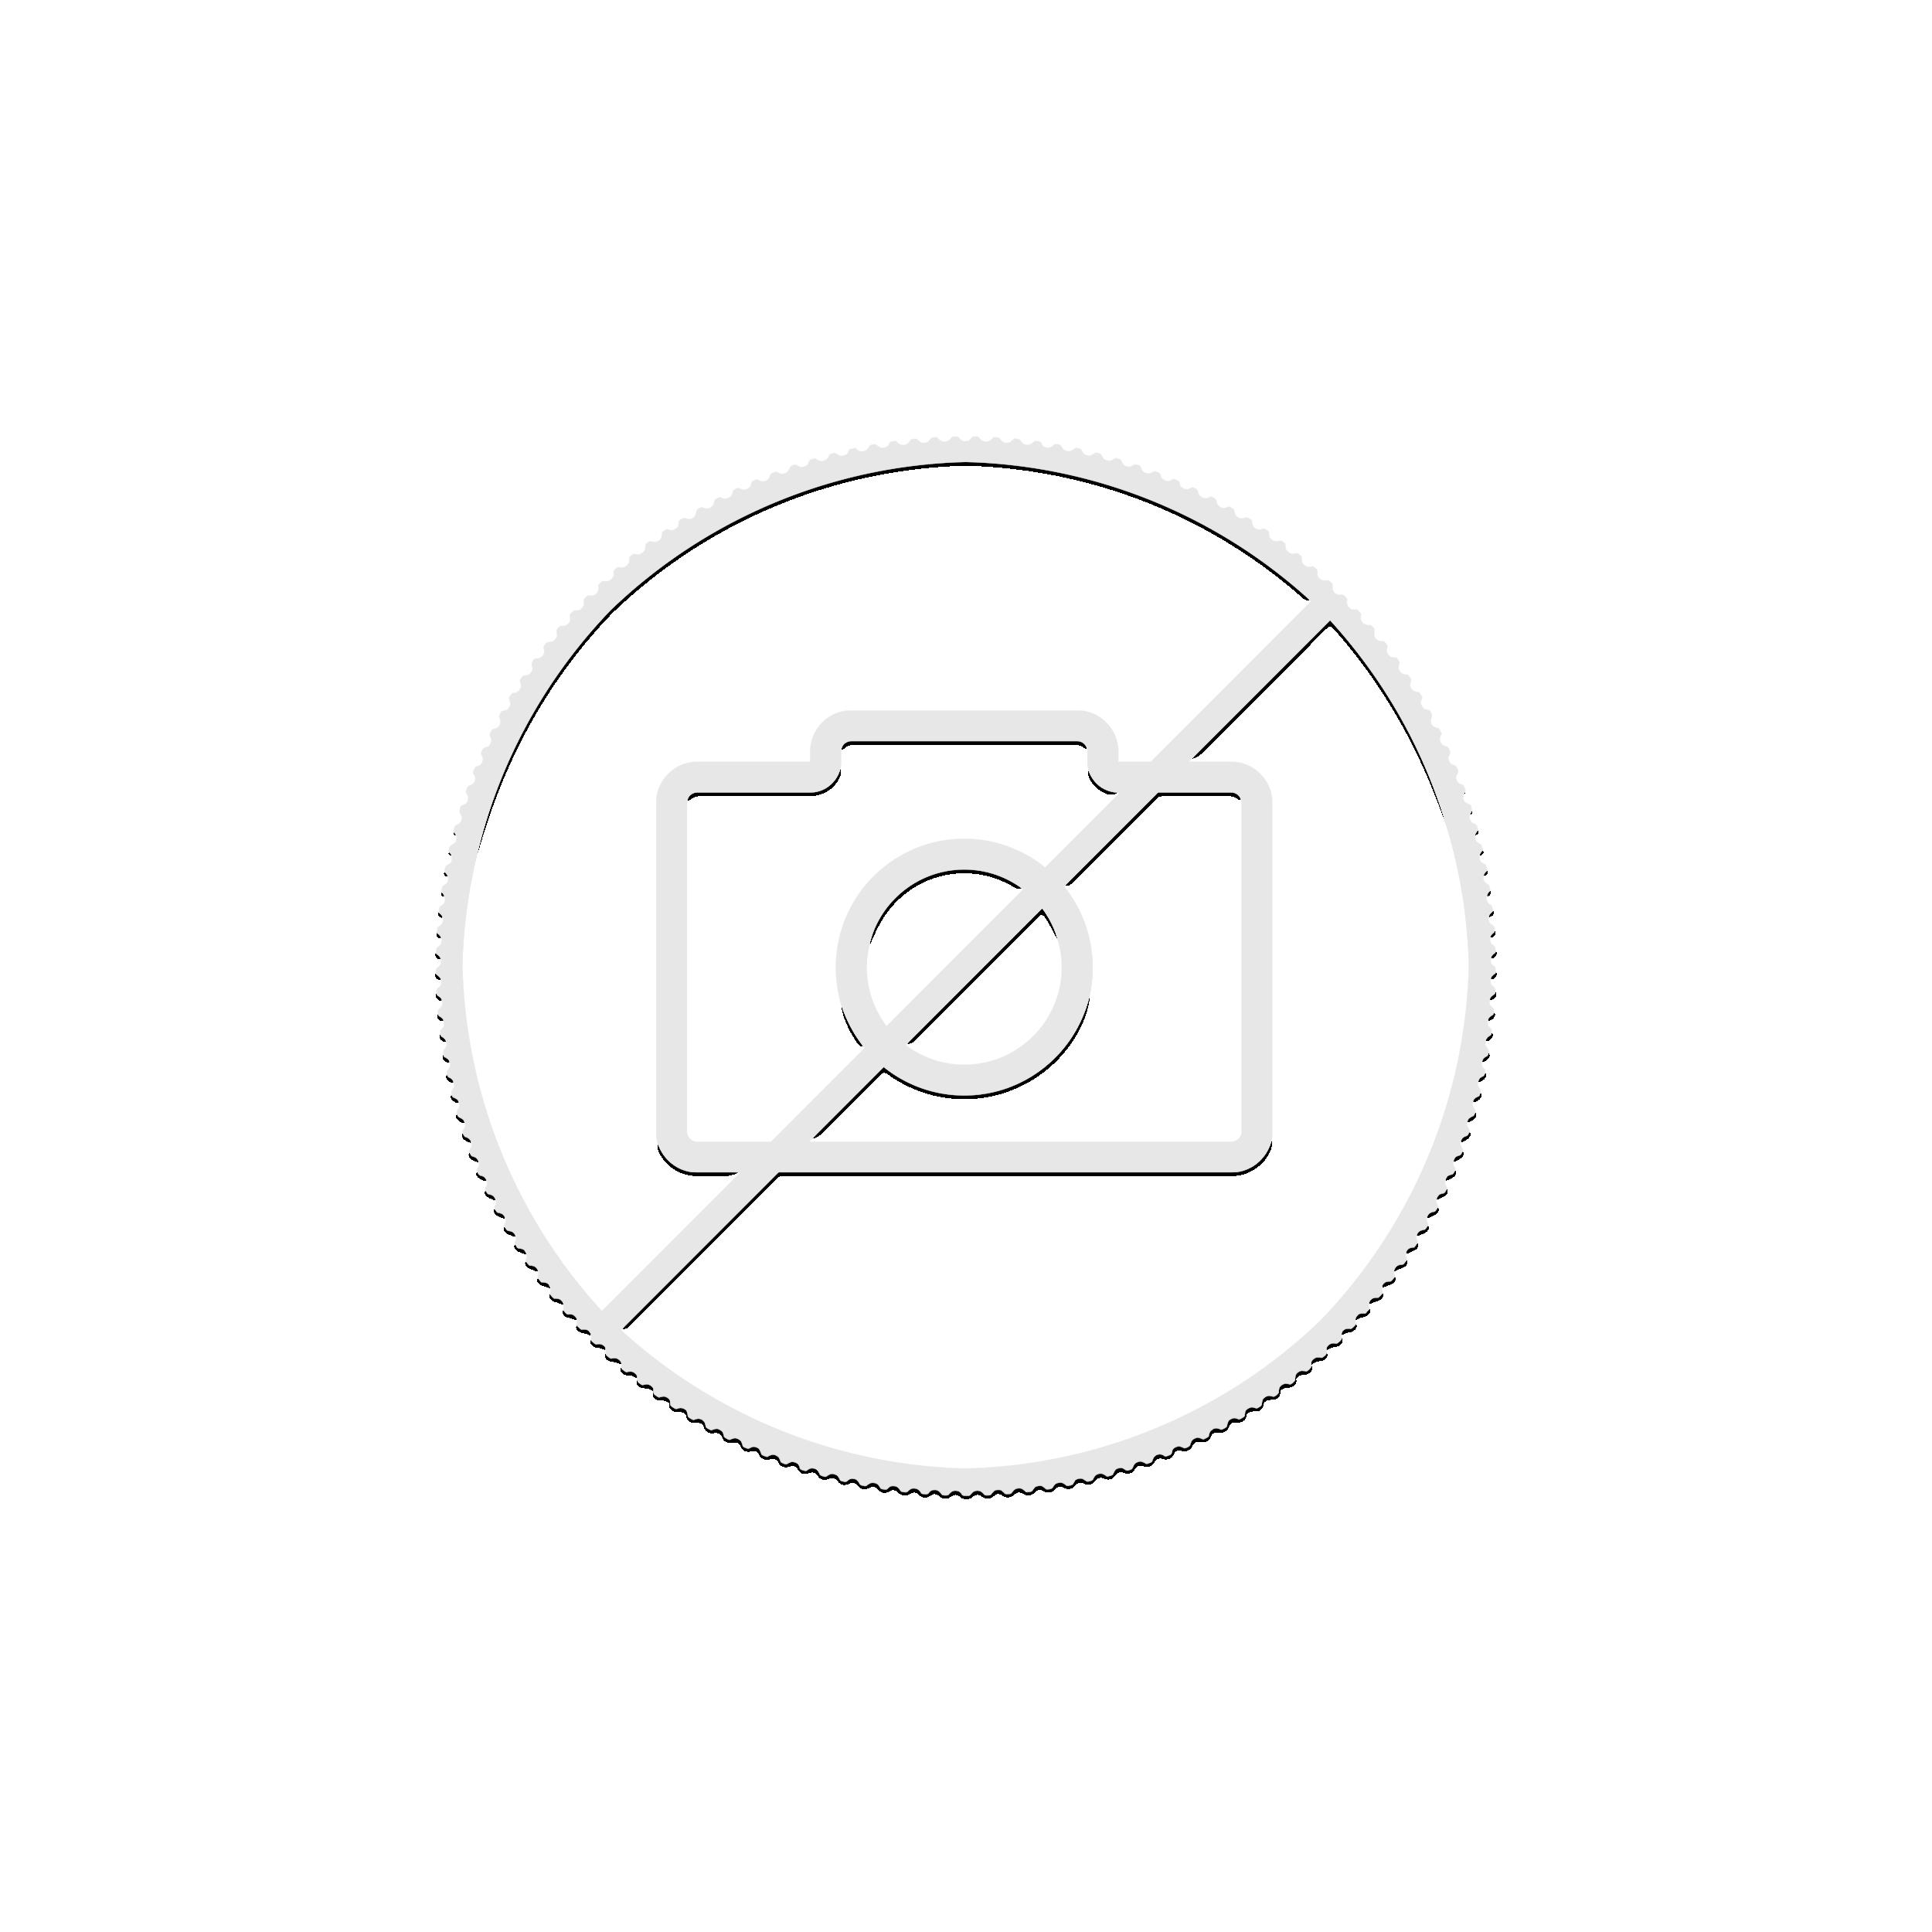 Gold bar 50 grams C. Hafner